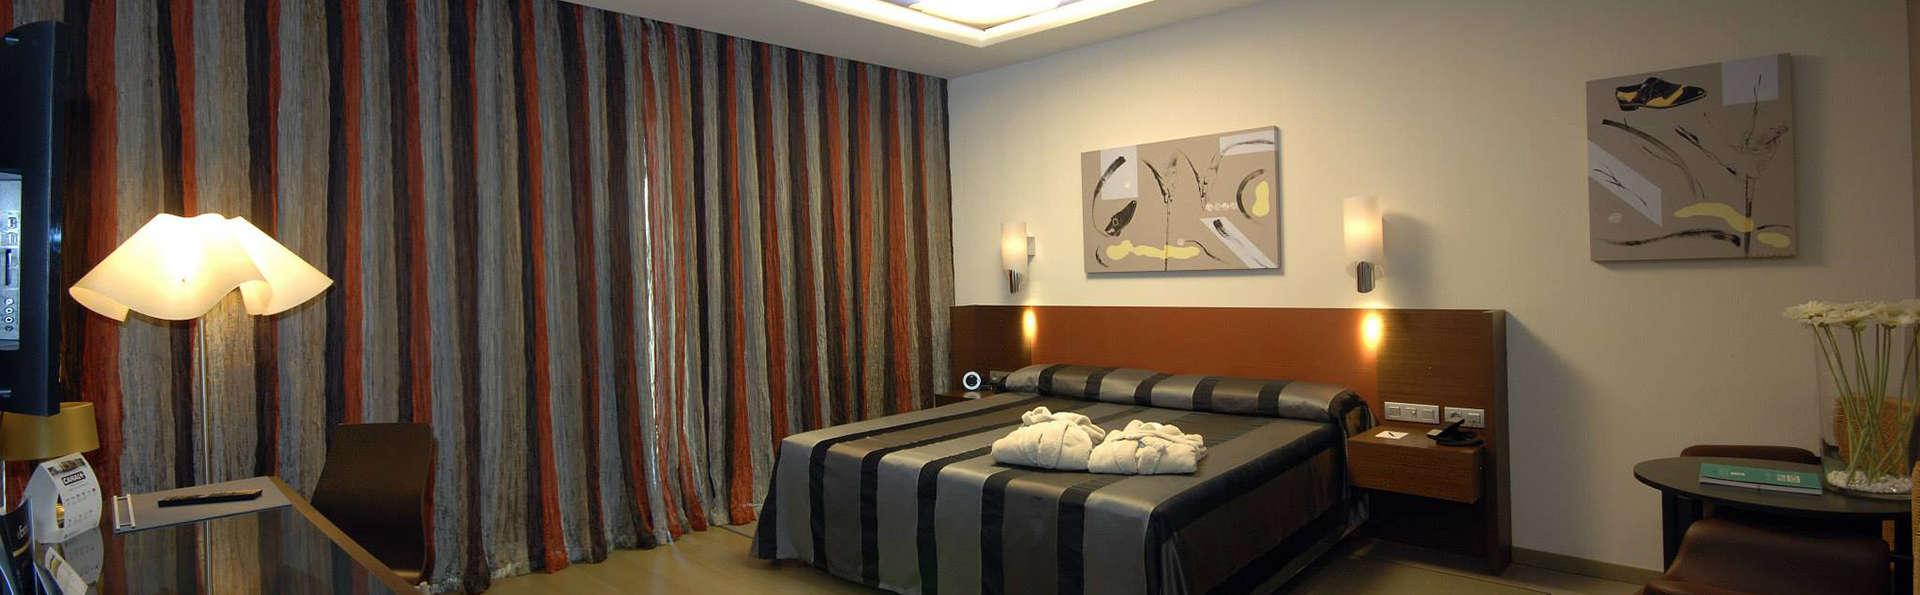 Sercotel Hotel El Encin Golf - edit_room2.jpg